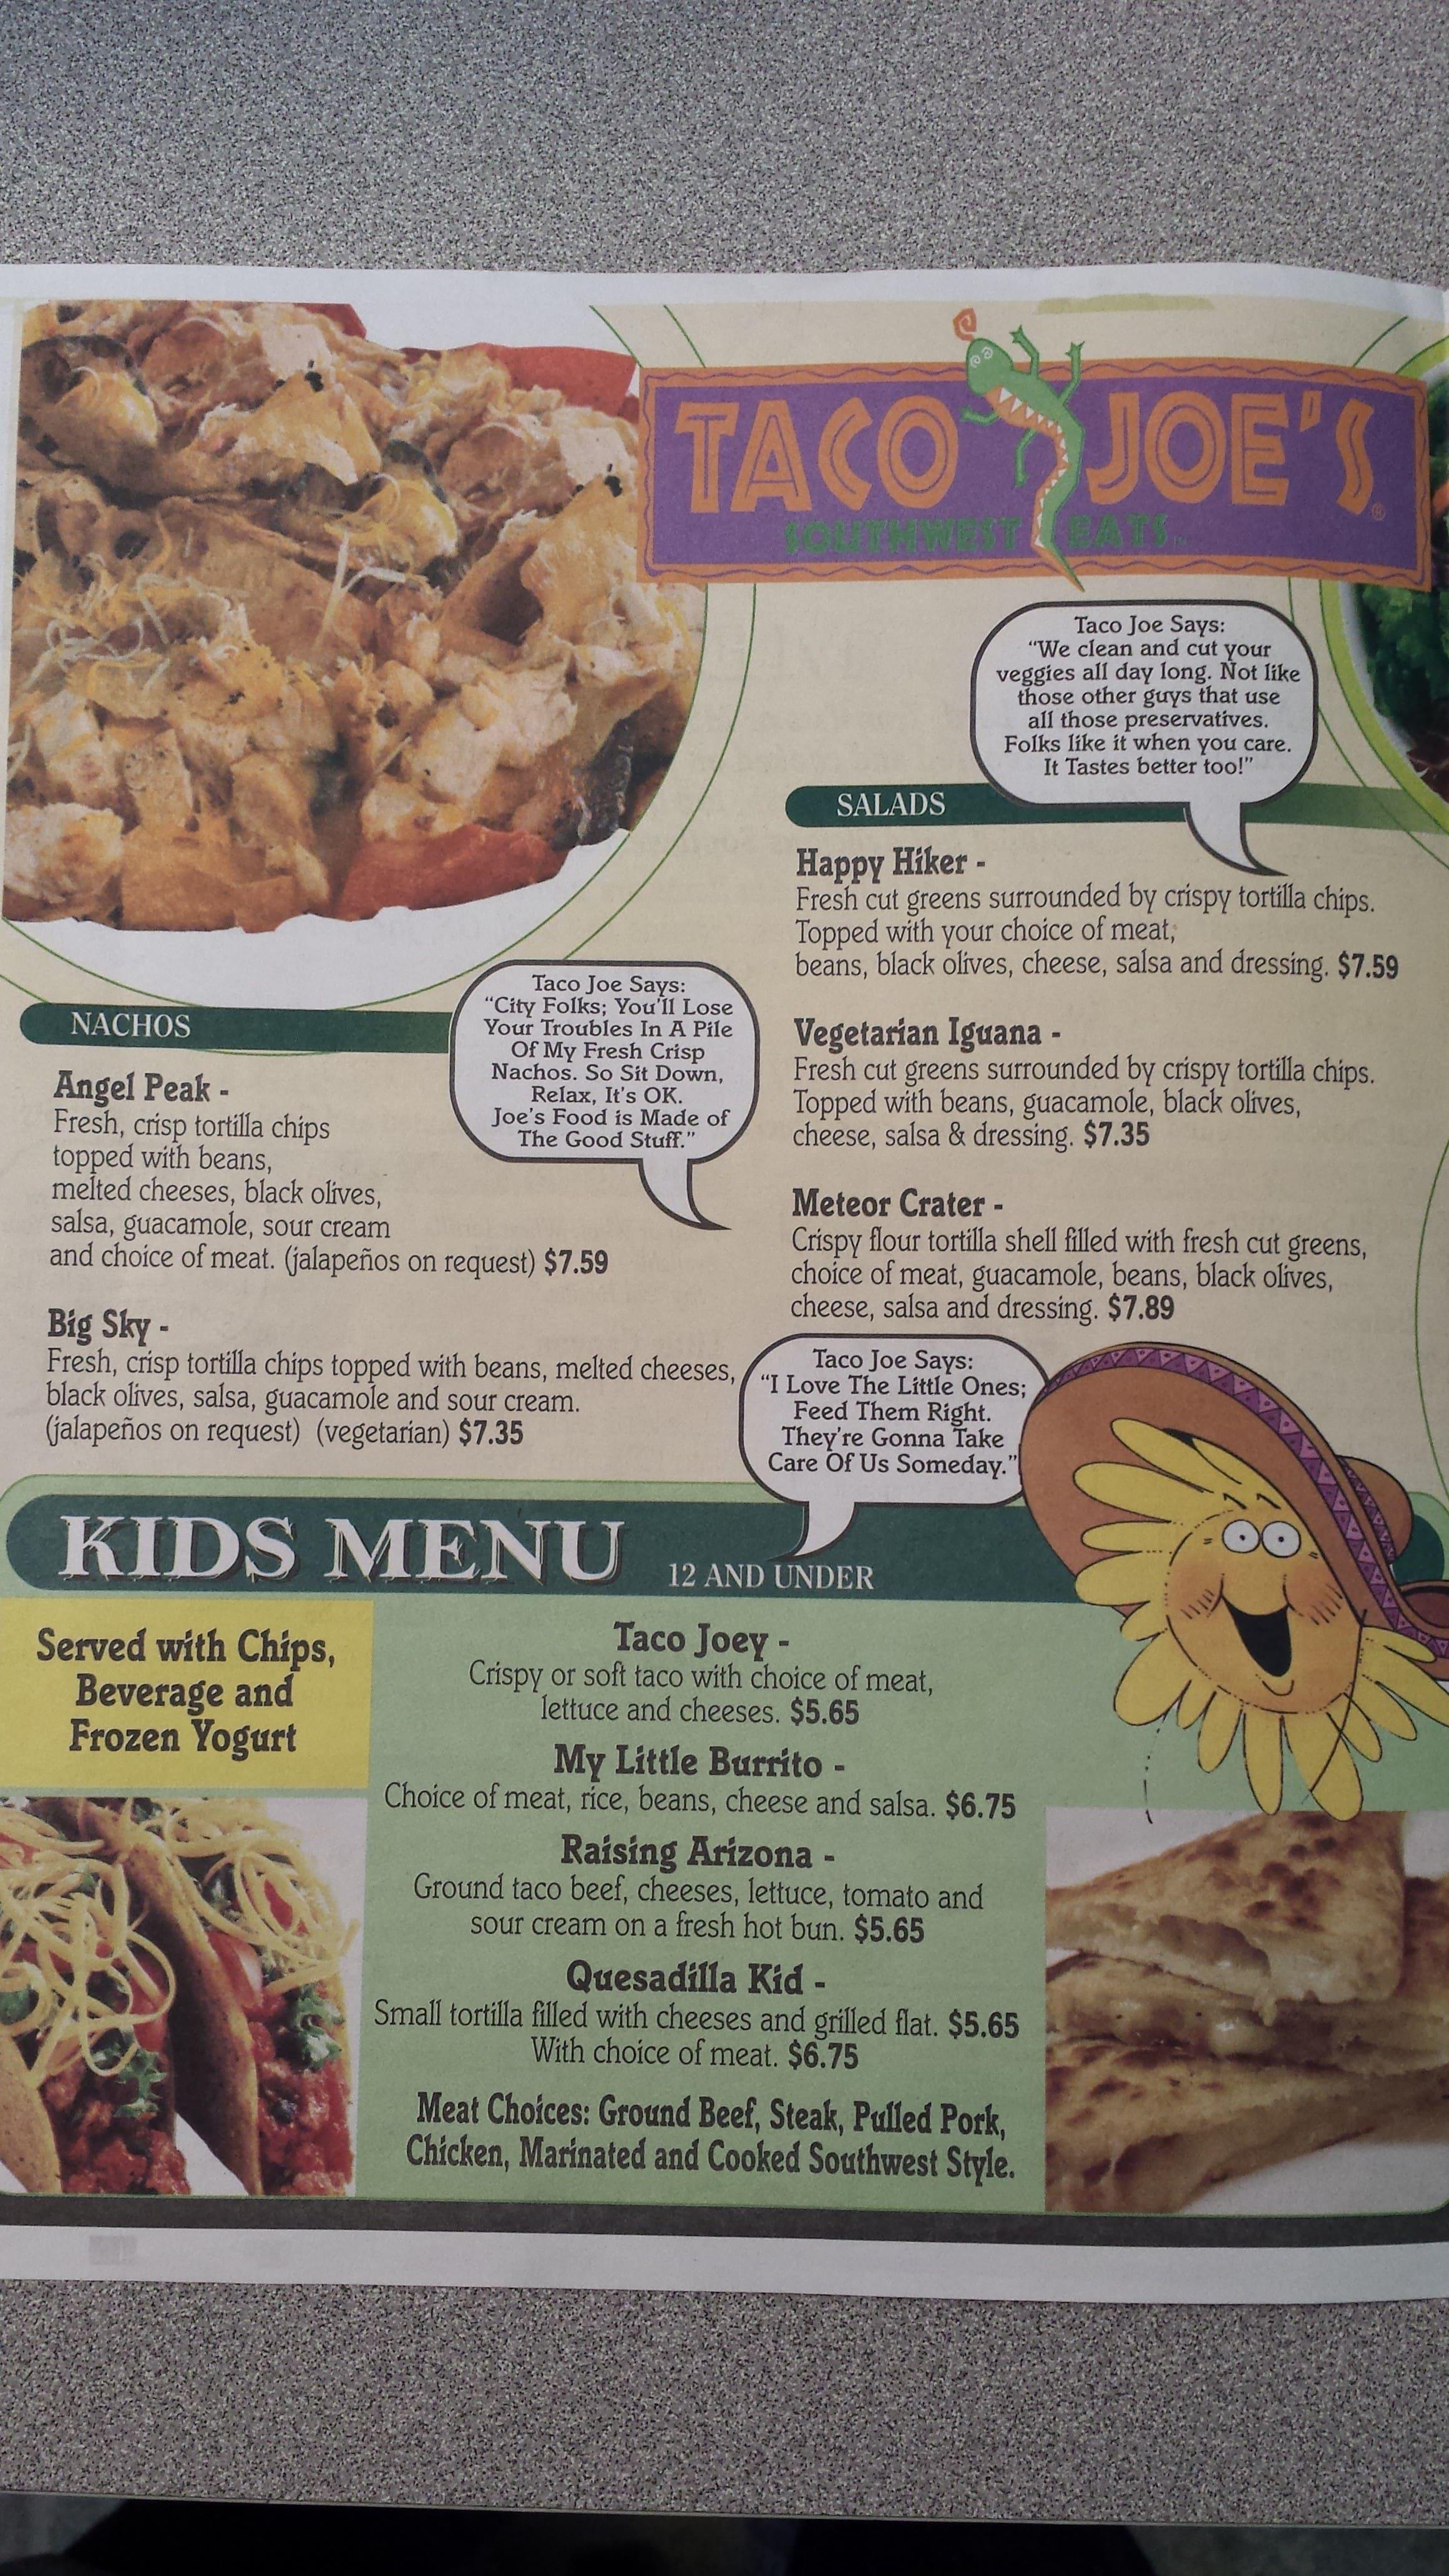 menu at taco joes restaurant, massapequa